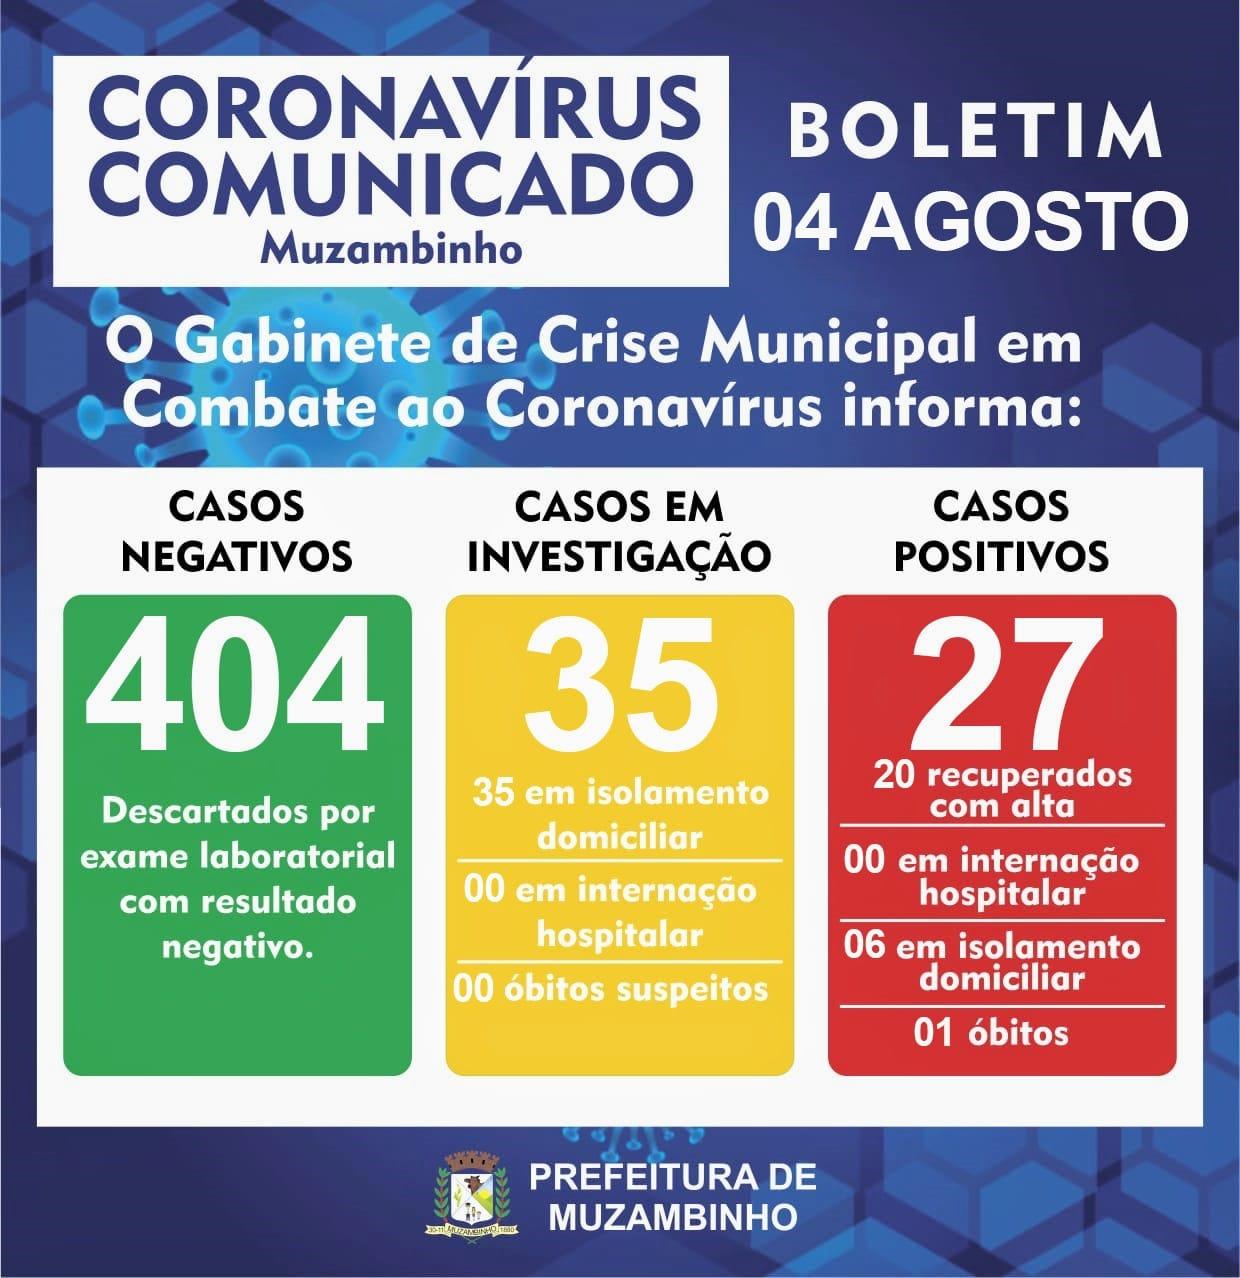 a5a532ce-8b1d-4872-ba09-cac0a9bb31b1